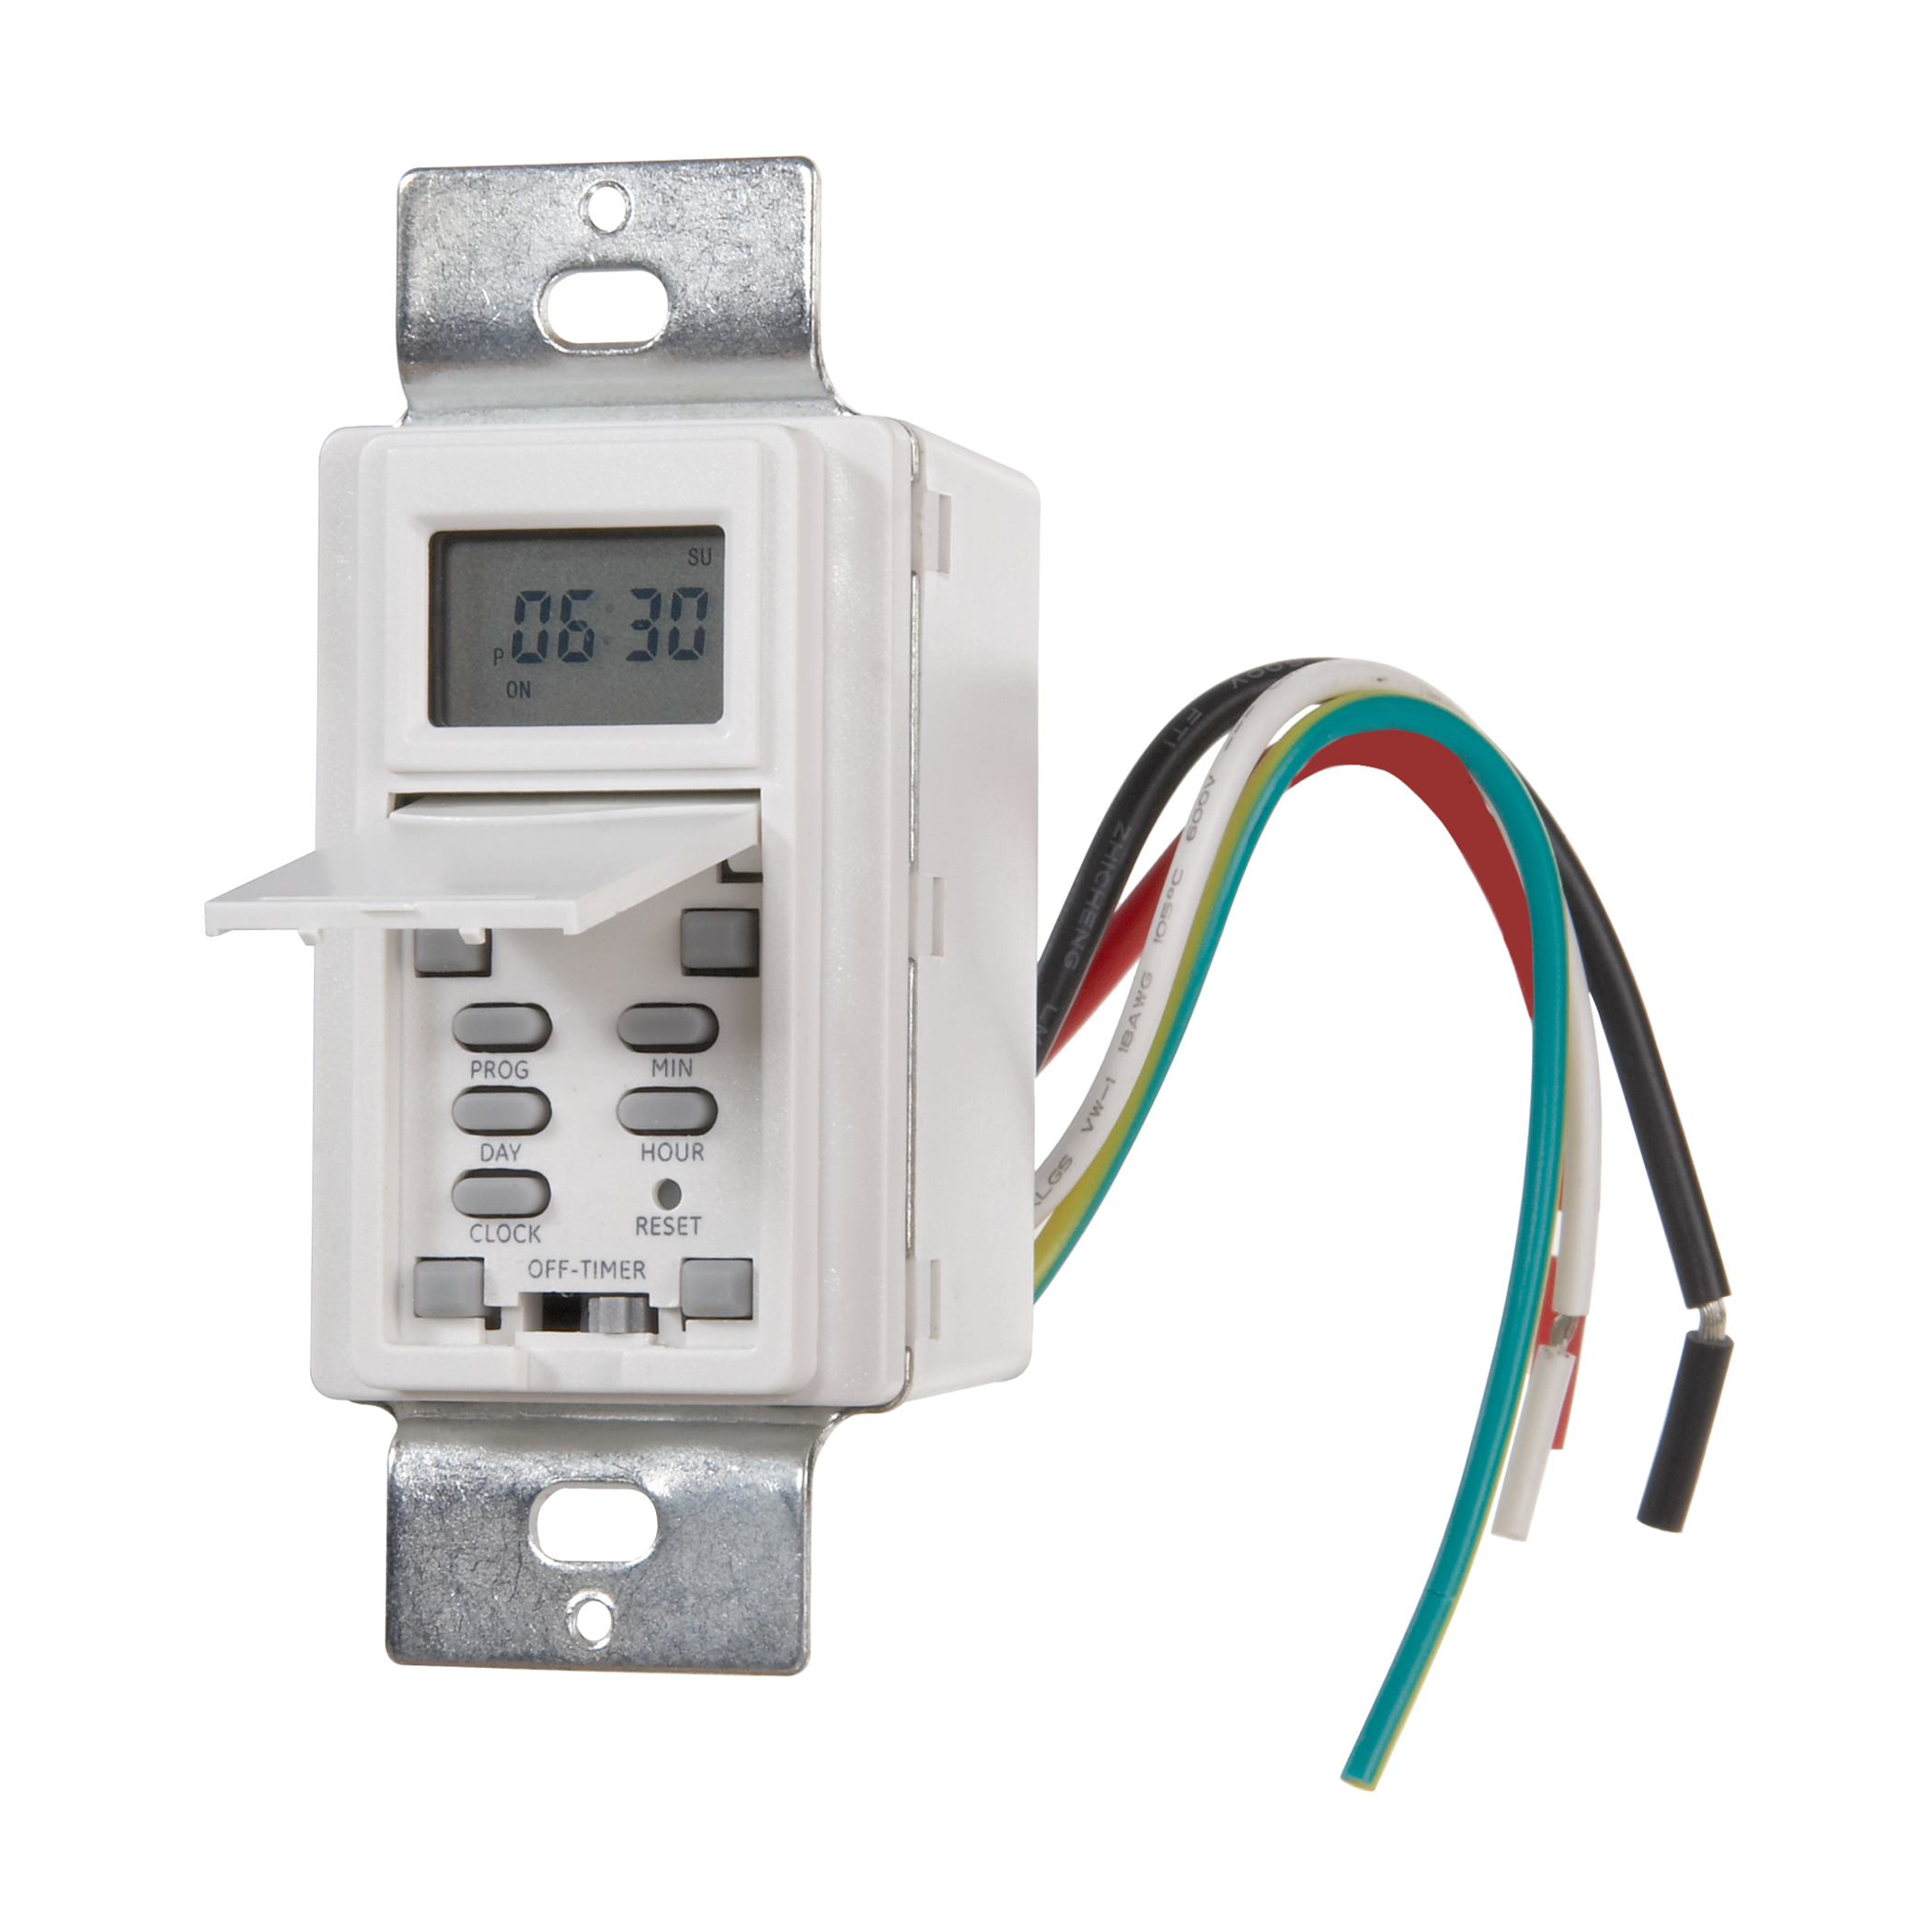 Westek TMDW30 Hardwire Indoor Digital Wall Switch Timer, White by Amertac